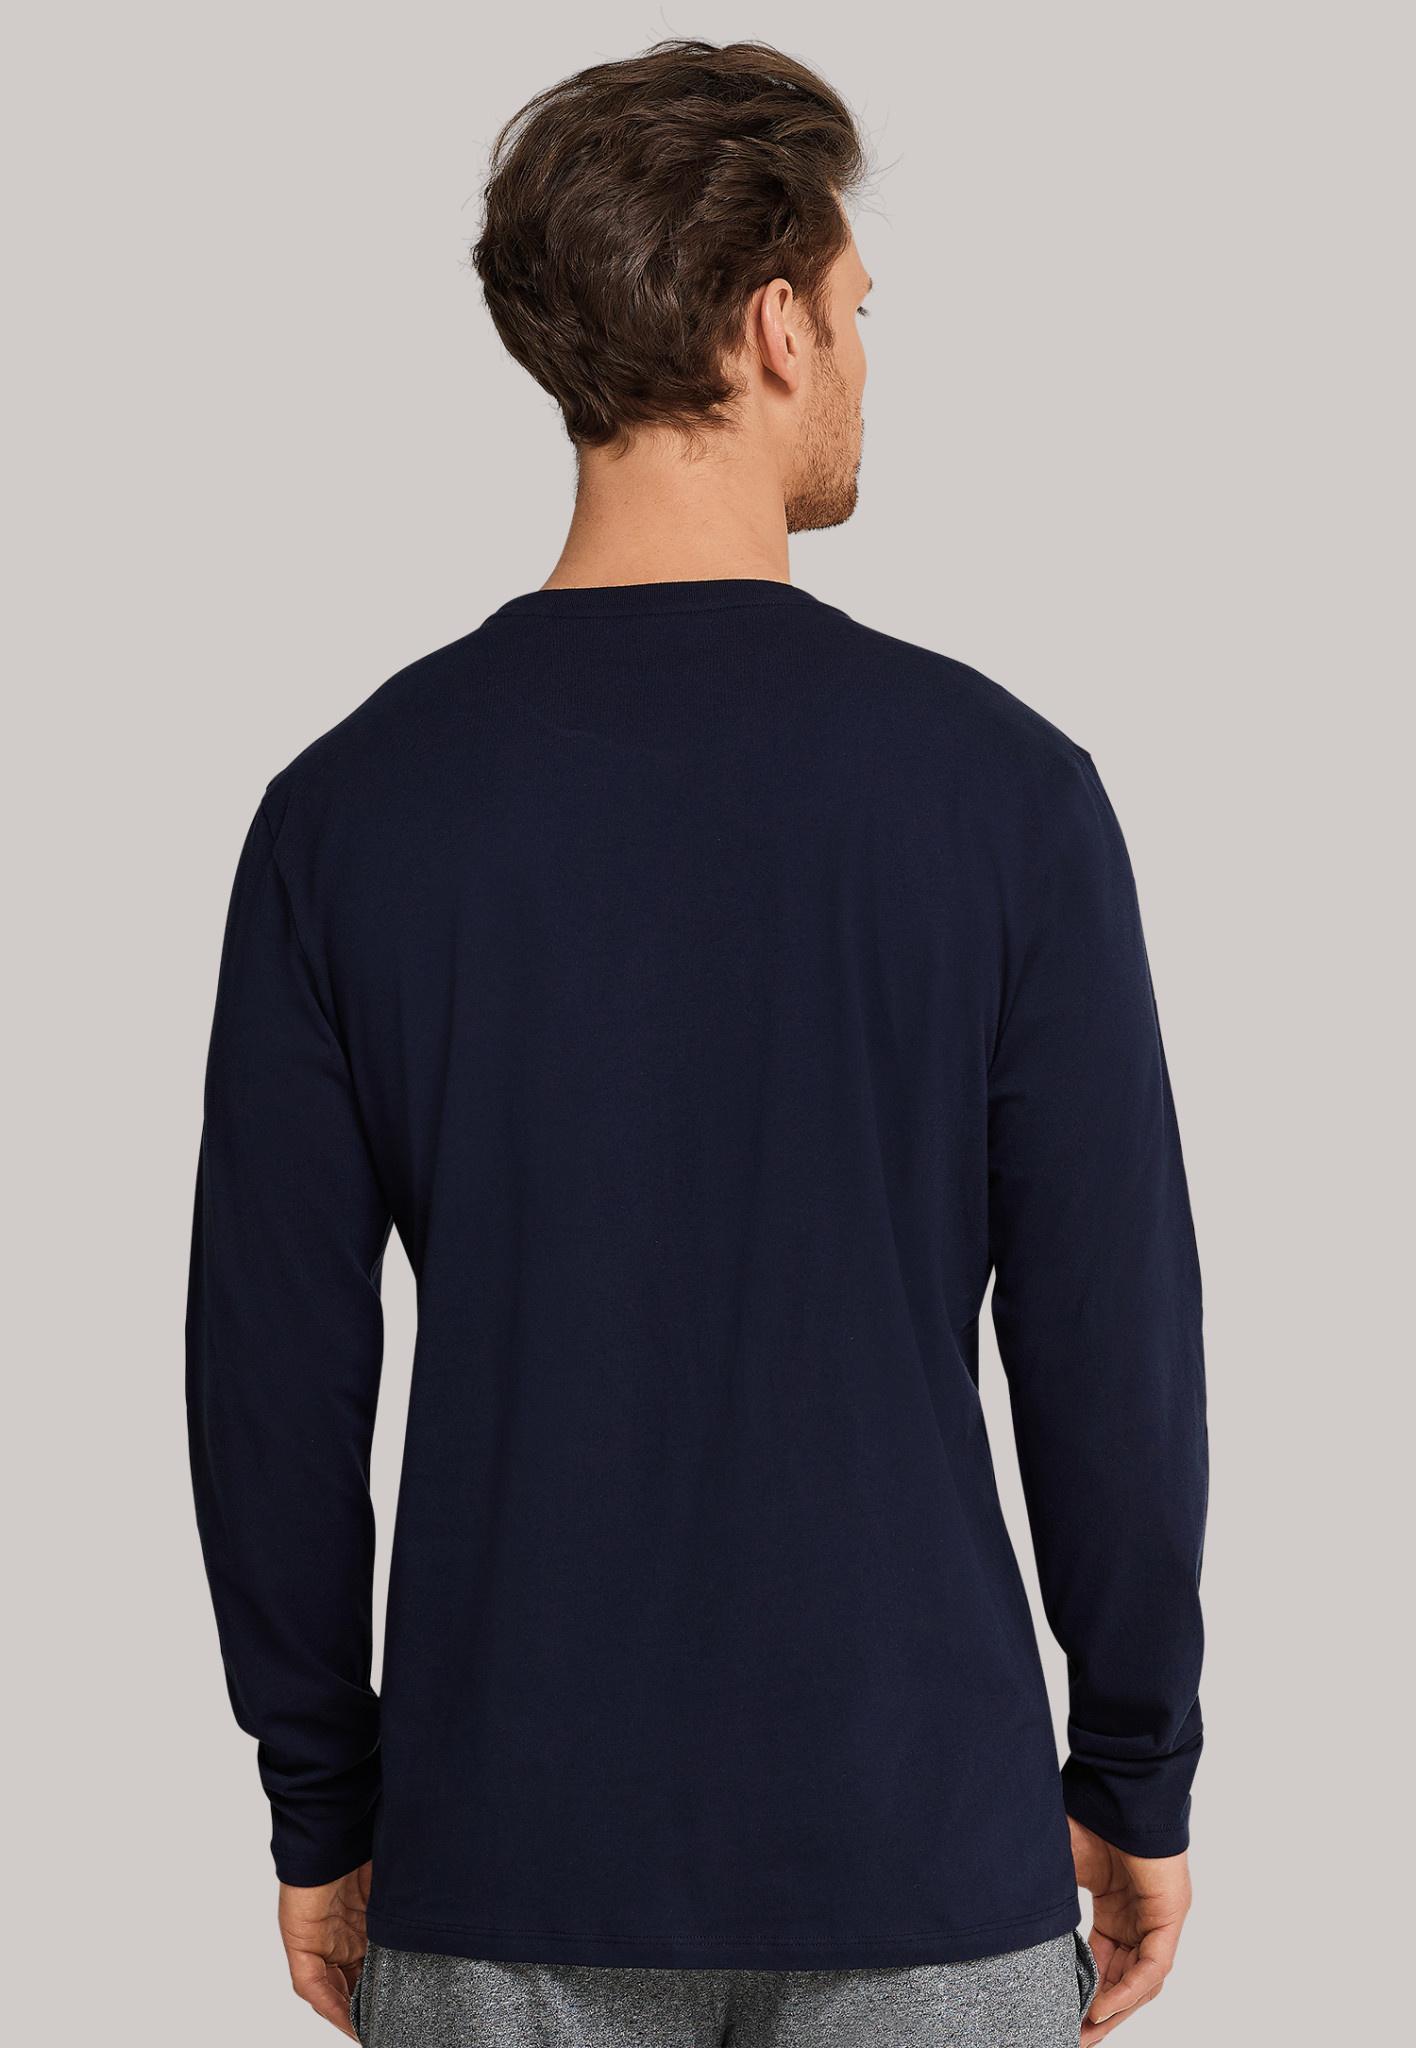 Shirt lange mouw Mix & Match 163835 - donkerblauw-2